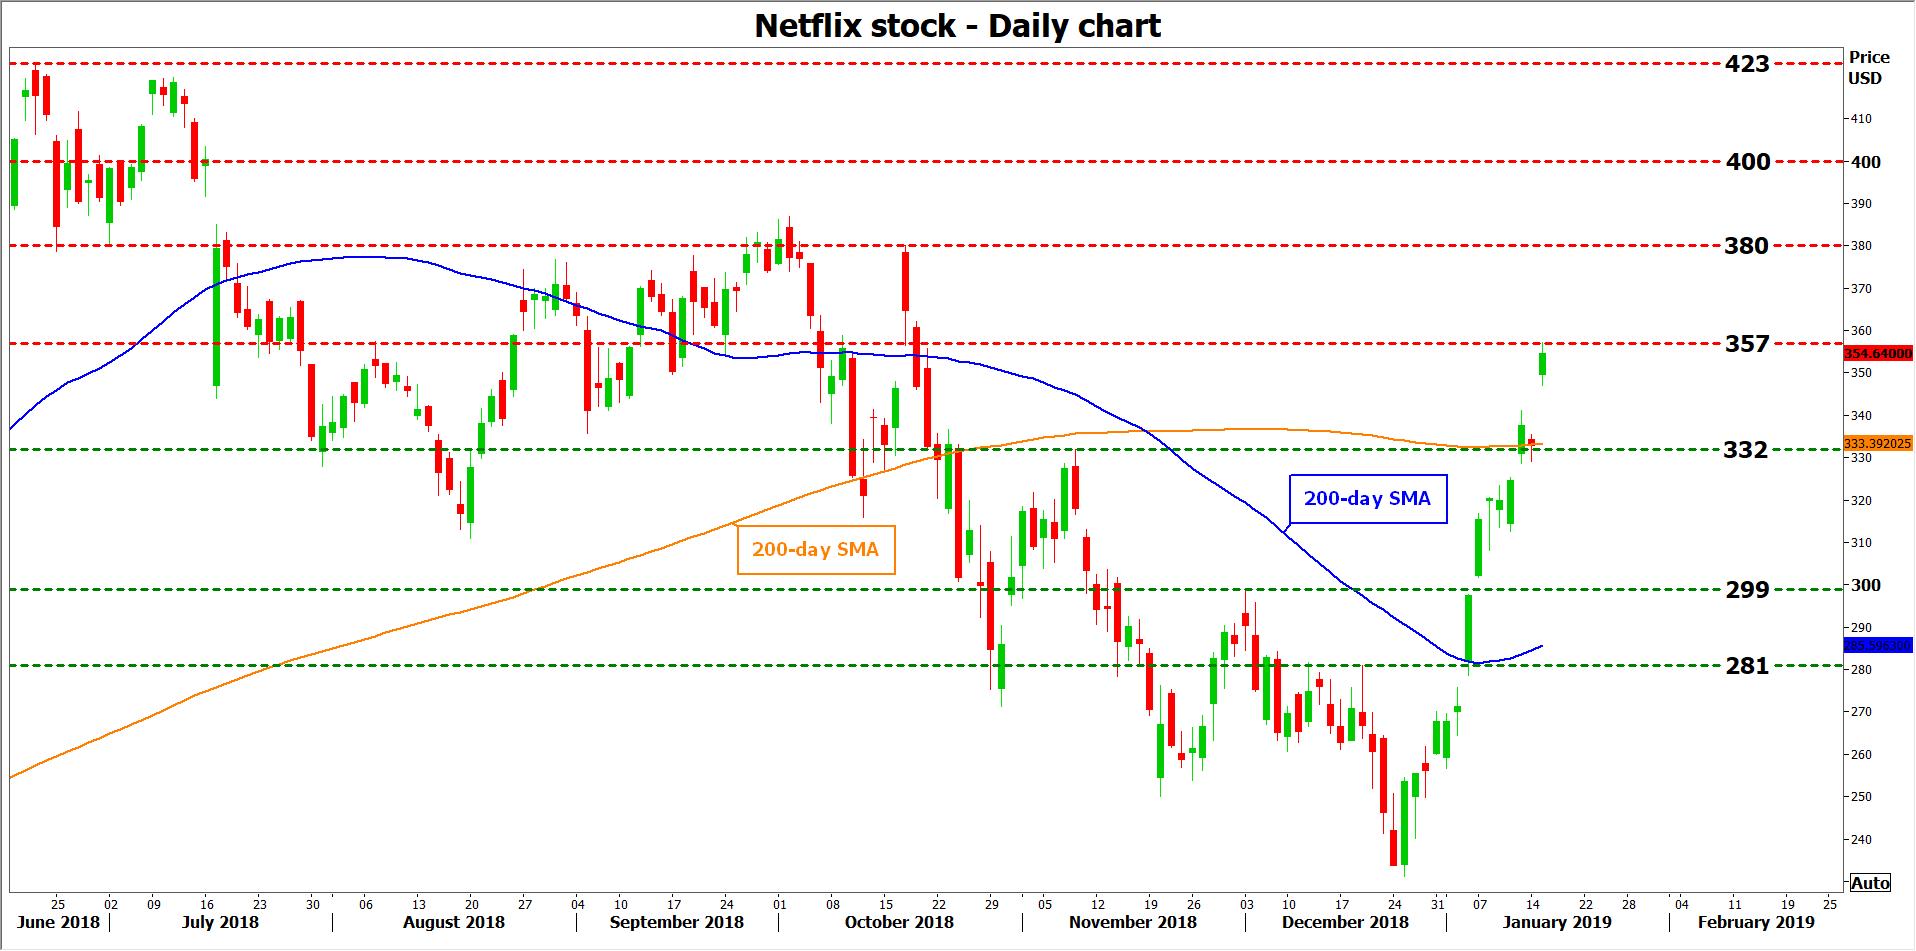 stock market news  u2013 netflix releases earnings  subscriber